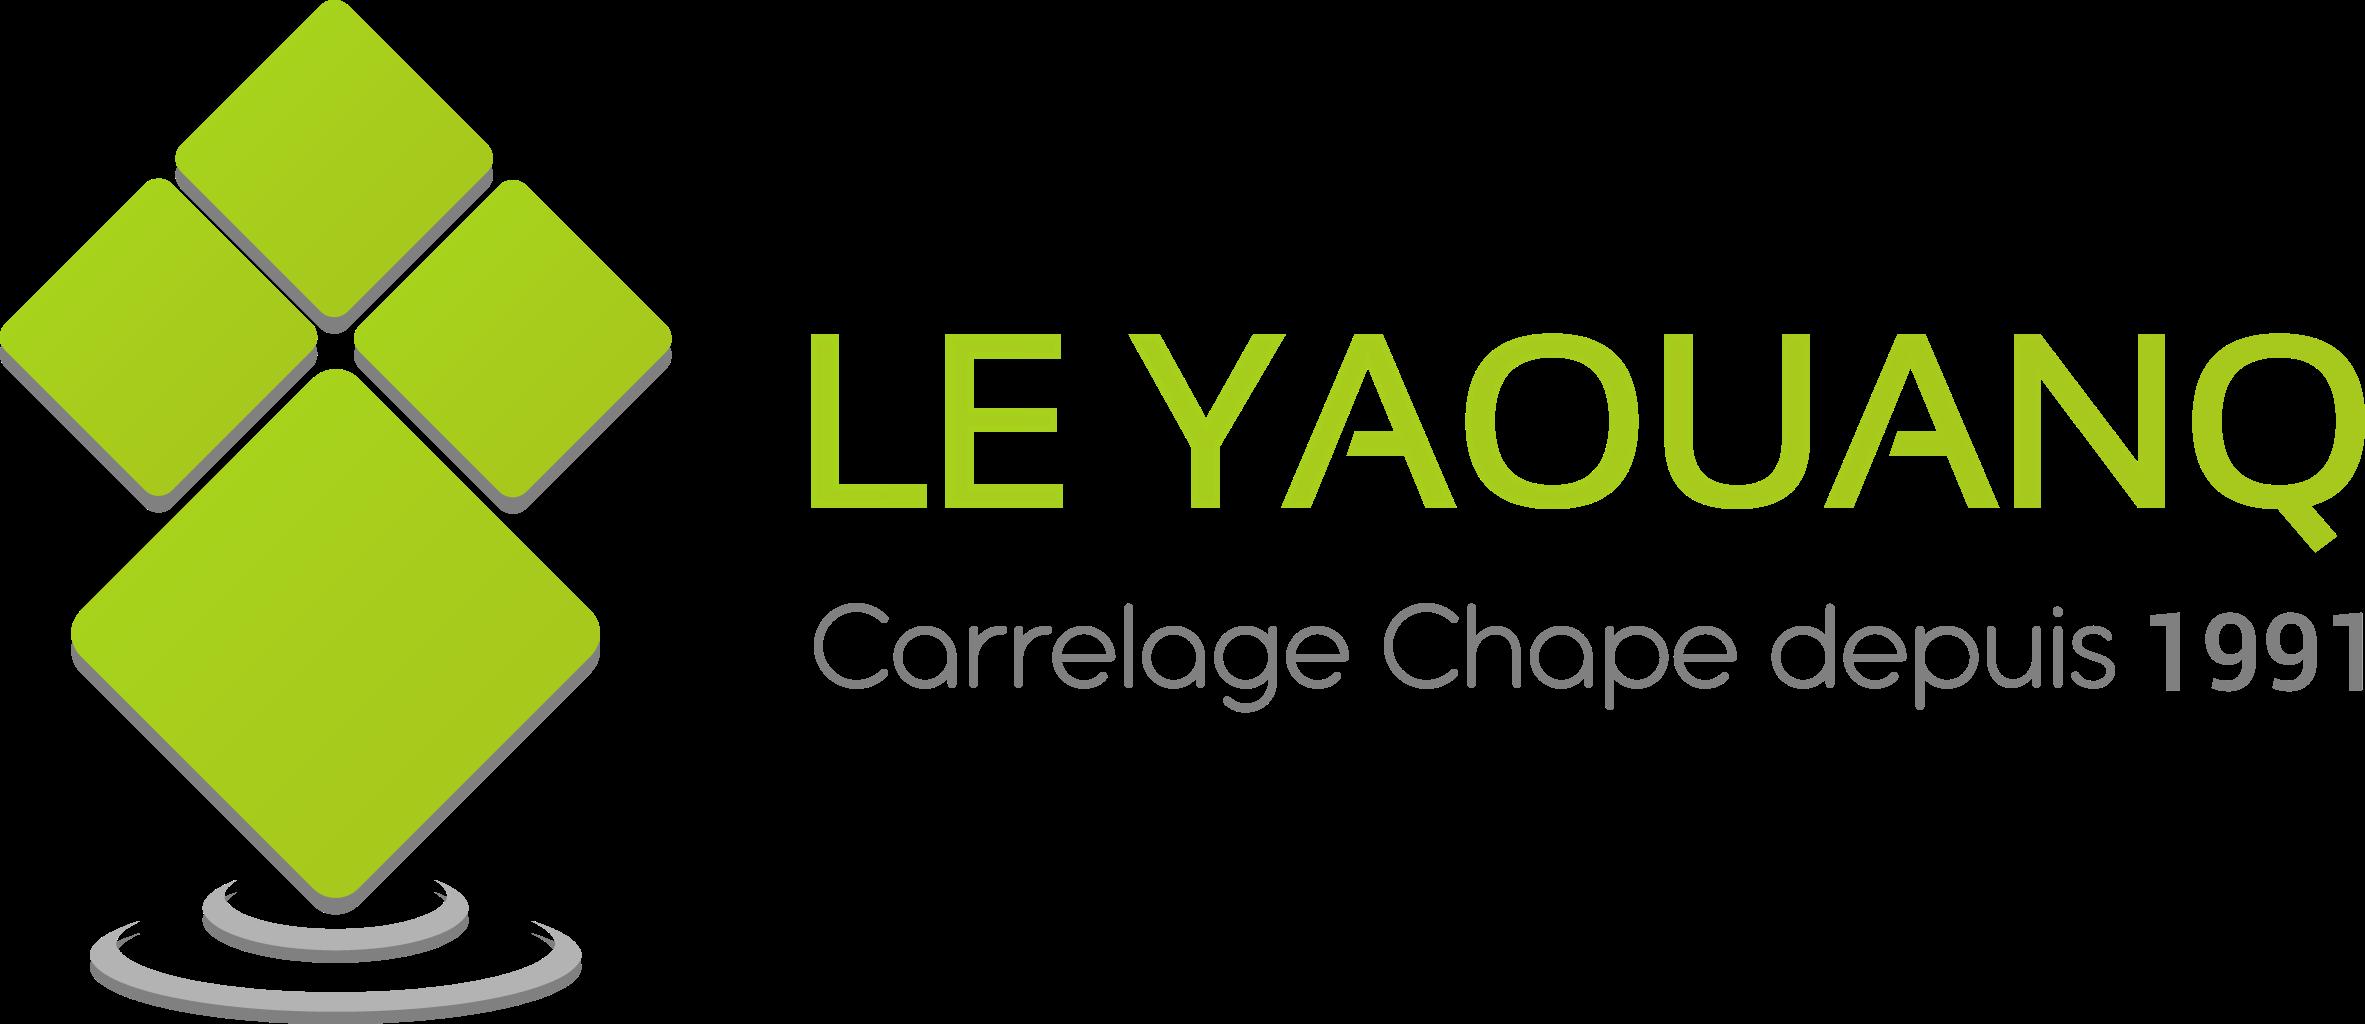 Carrelage Le Yaouanq